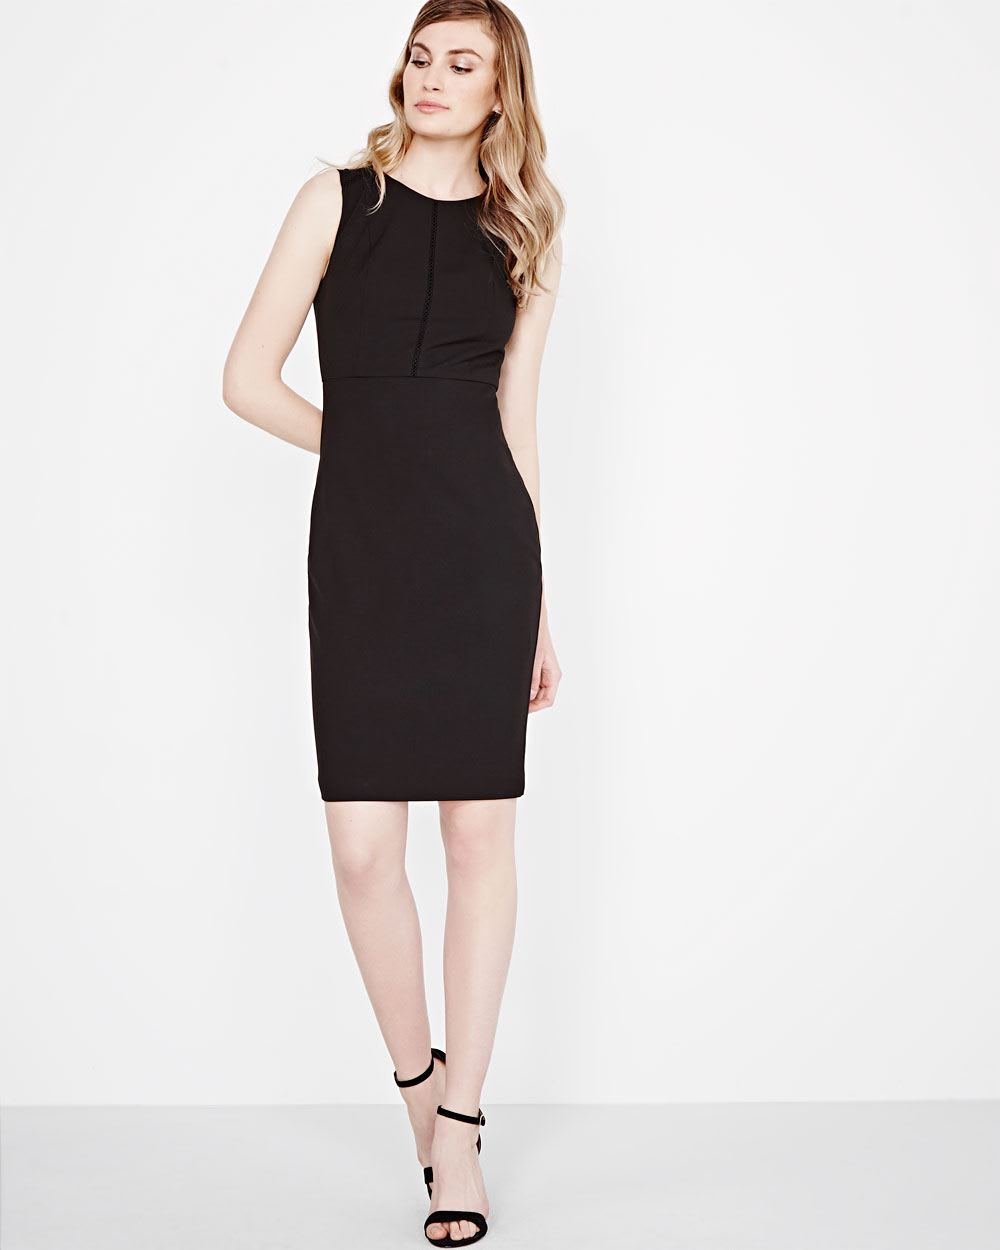 a9214e9edb Fitted sleeveless dress